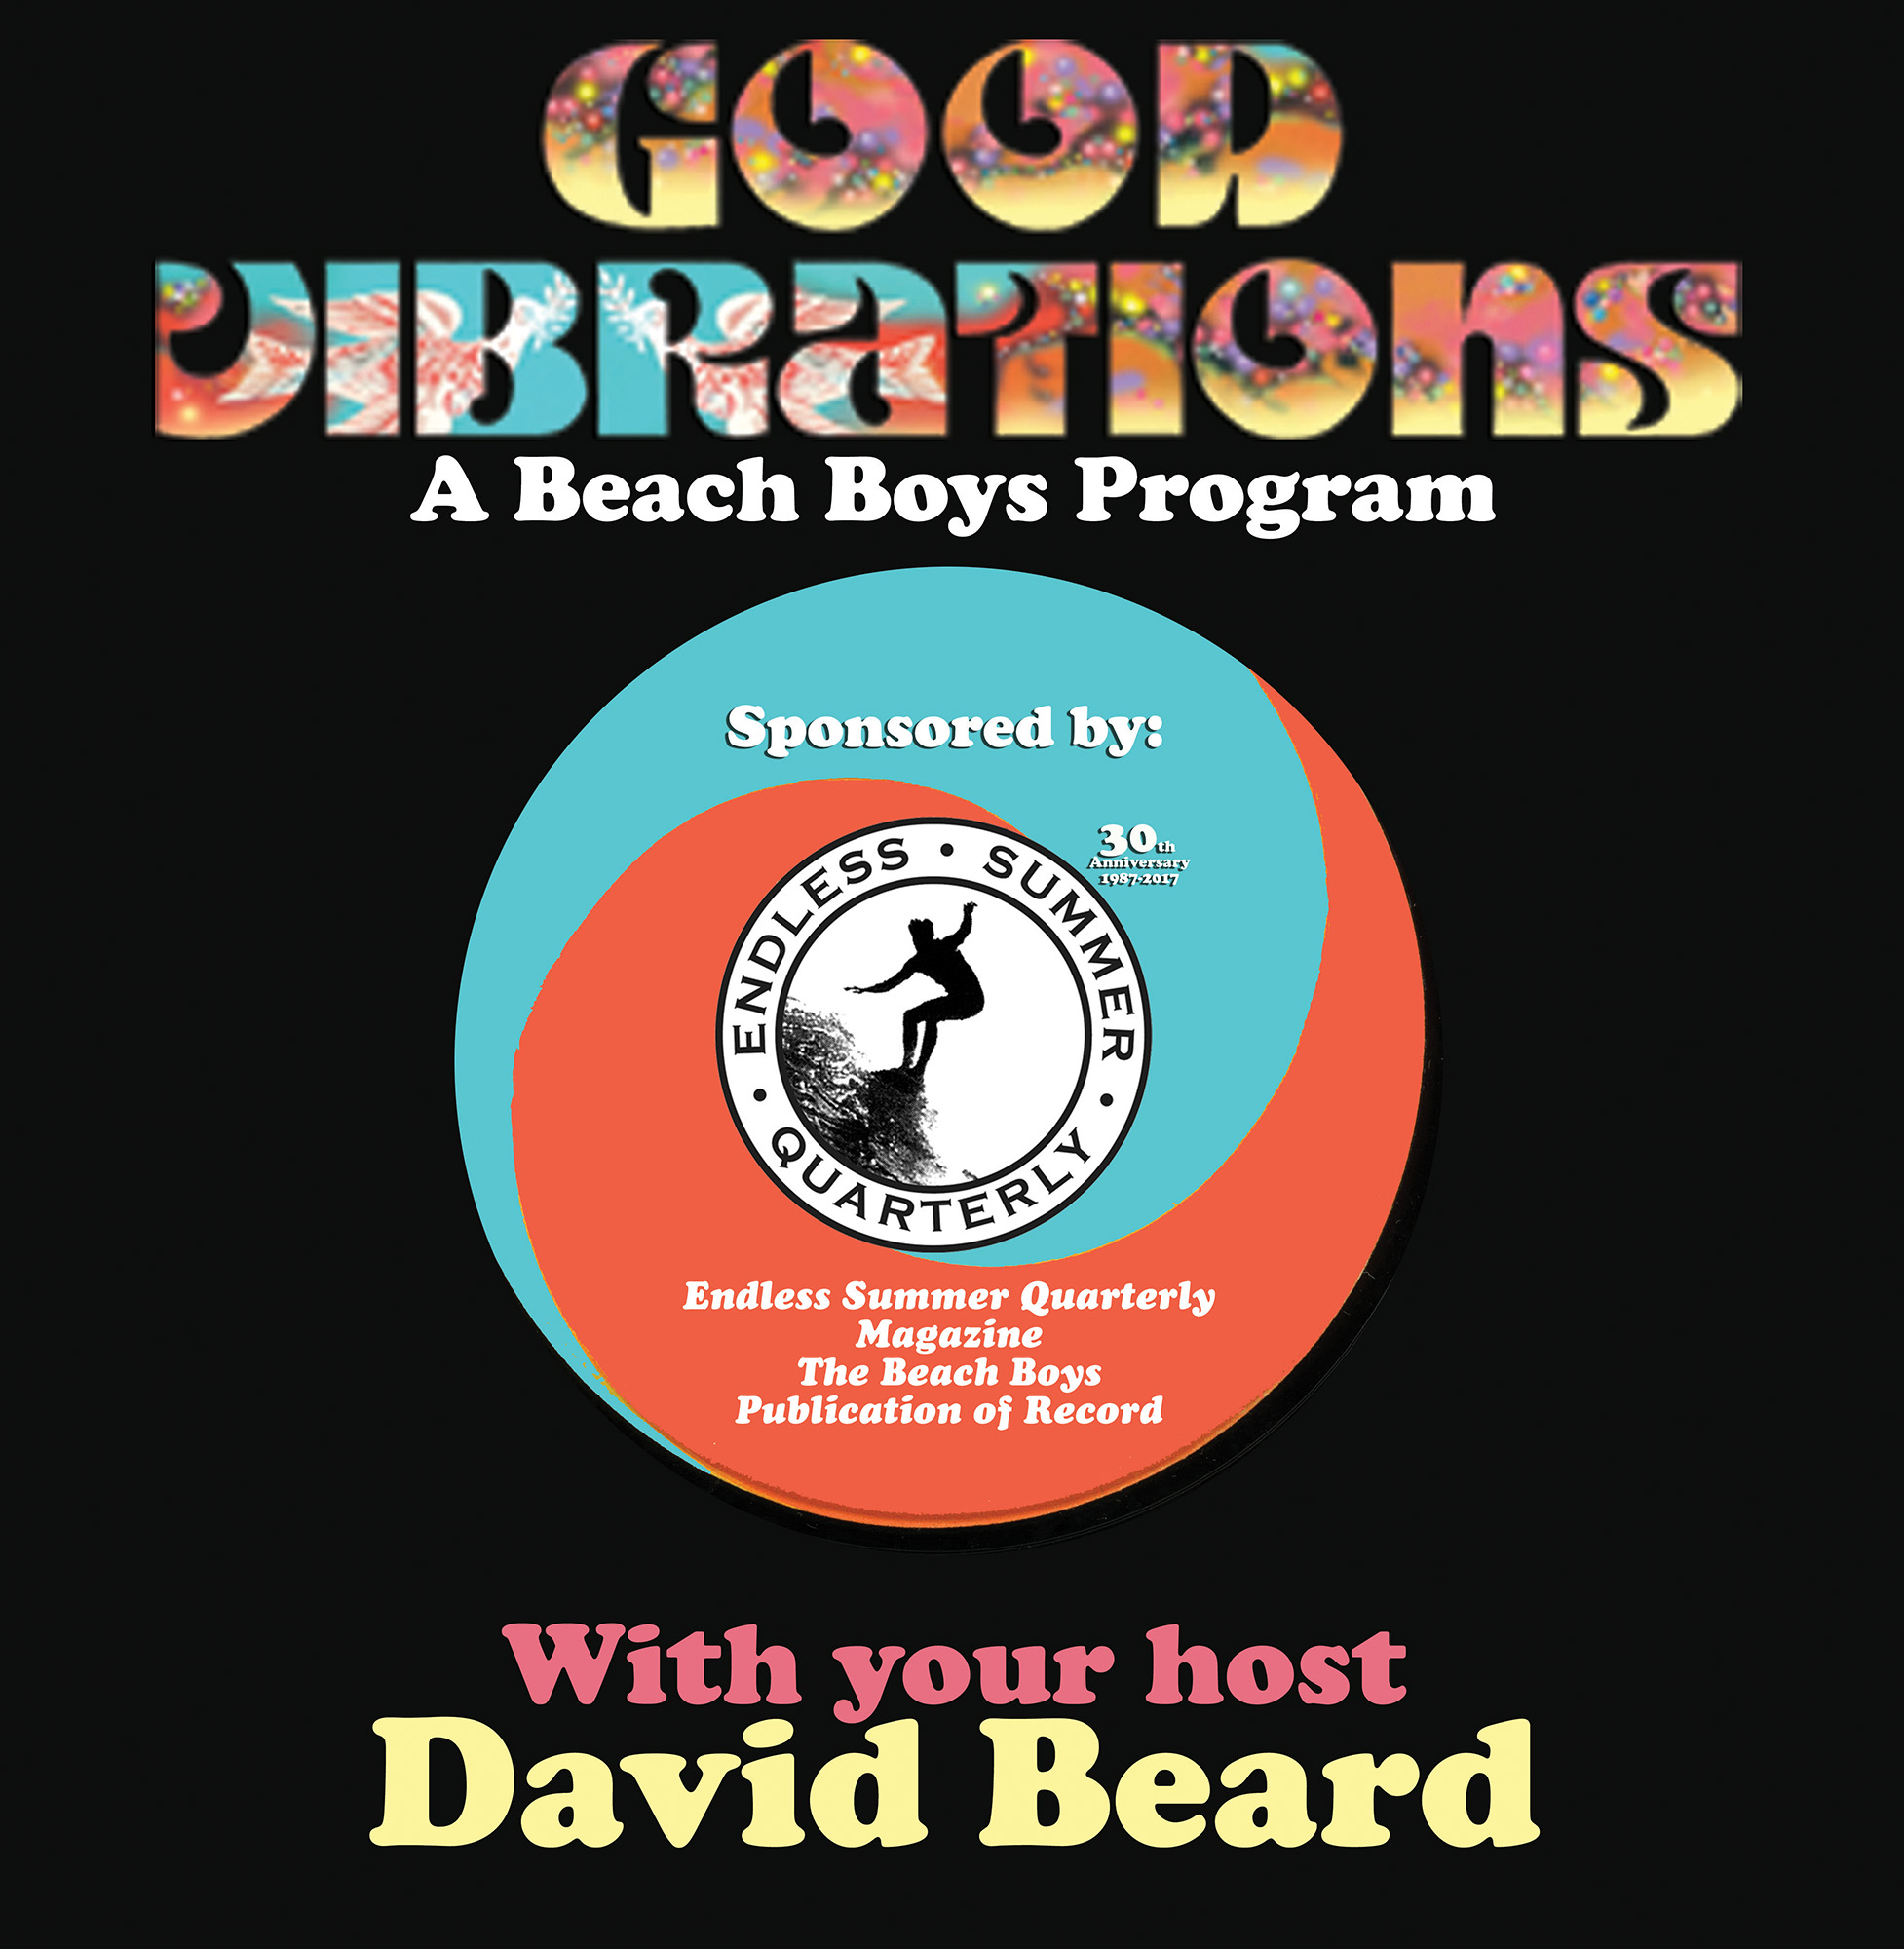 Good Vibrations A Beach Boys Music Program